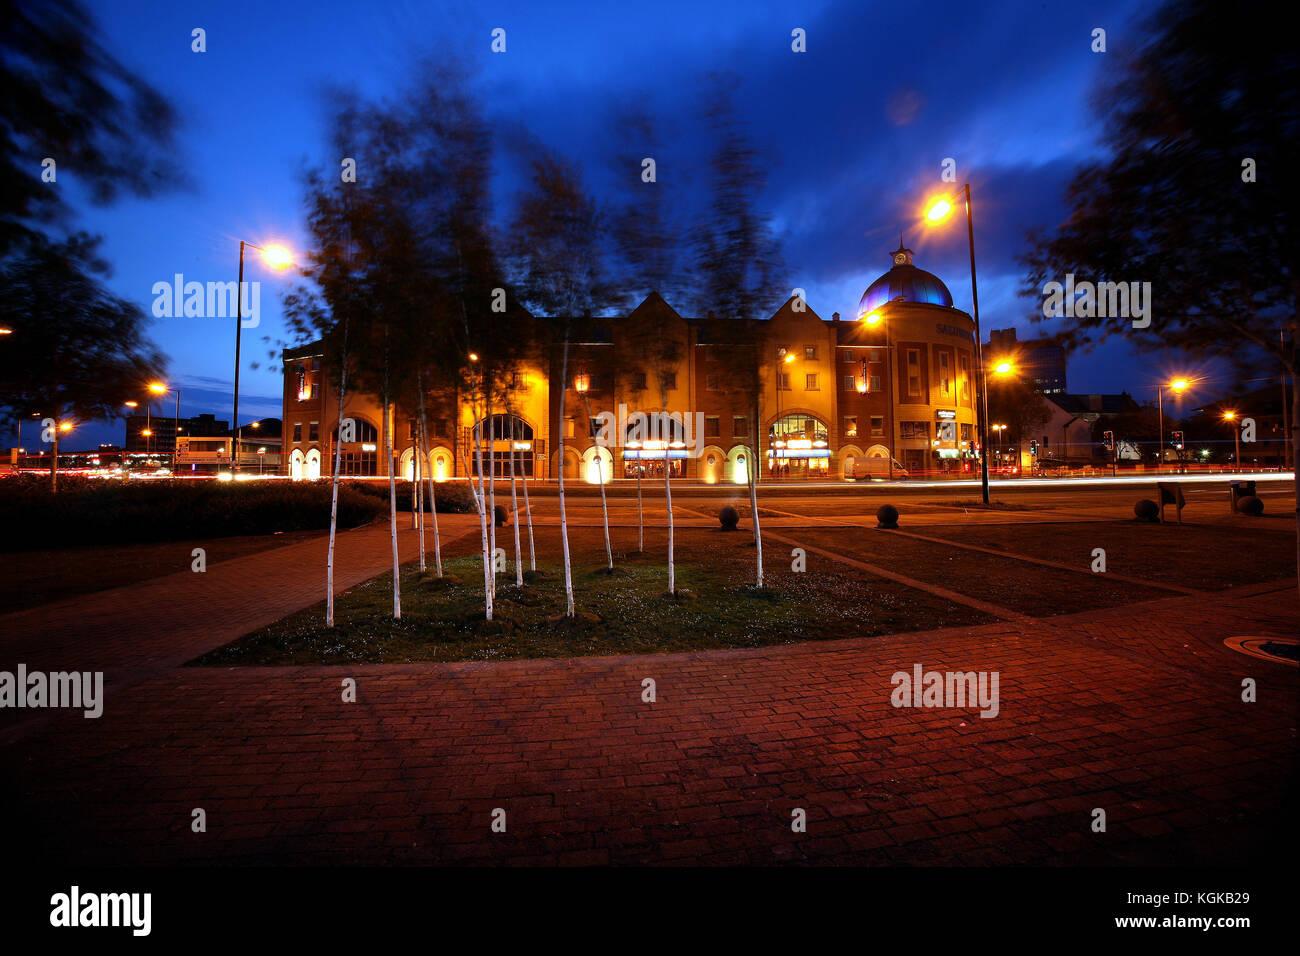 Salubrious Place, Swansea, Wales, UK - Stock Image